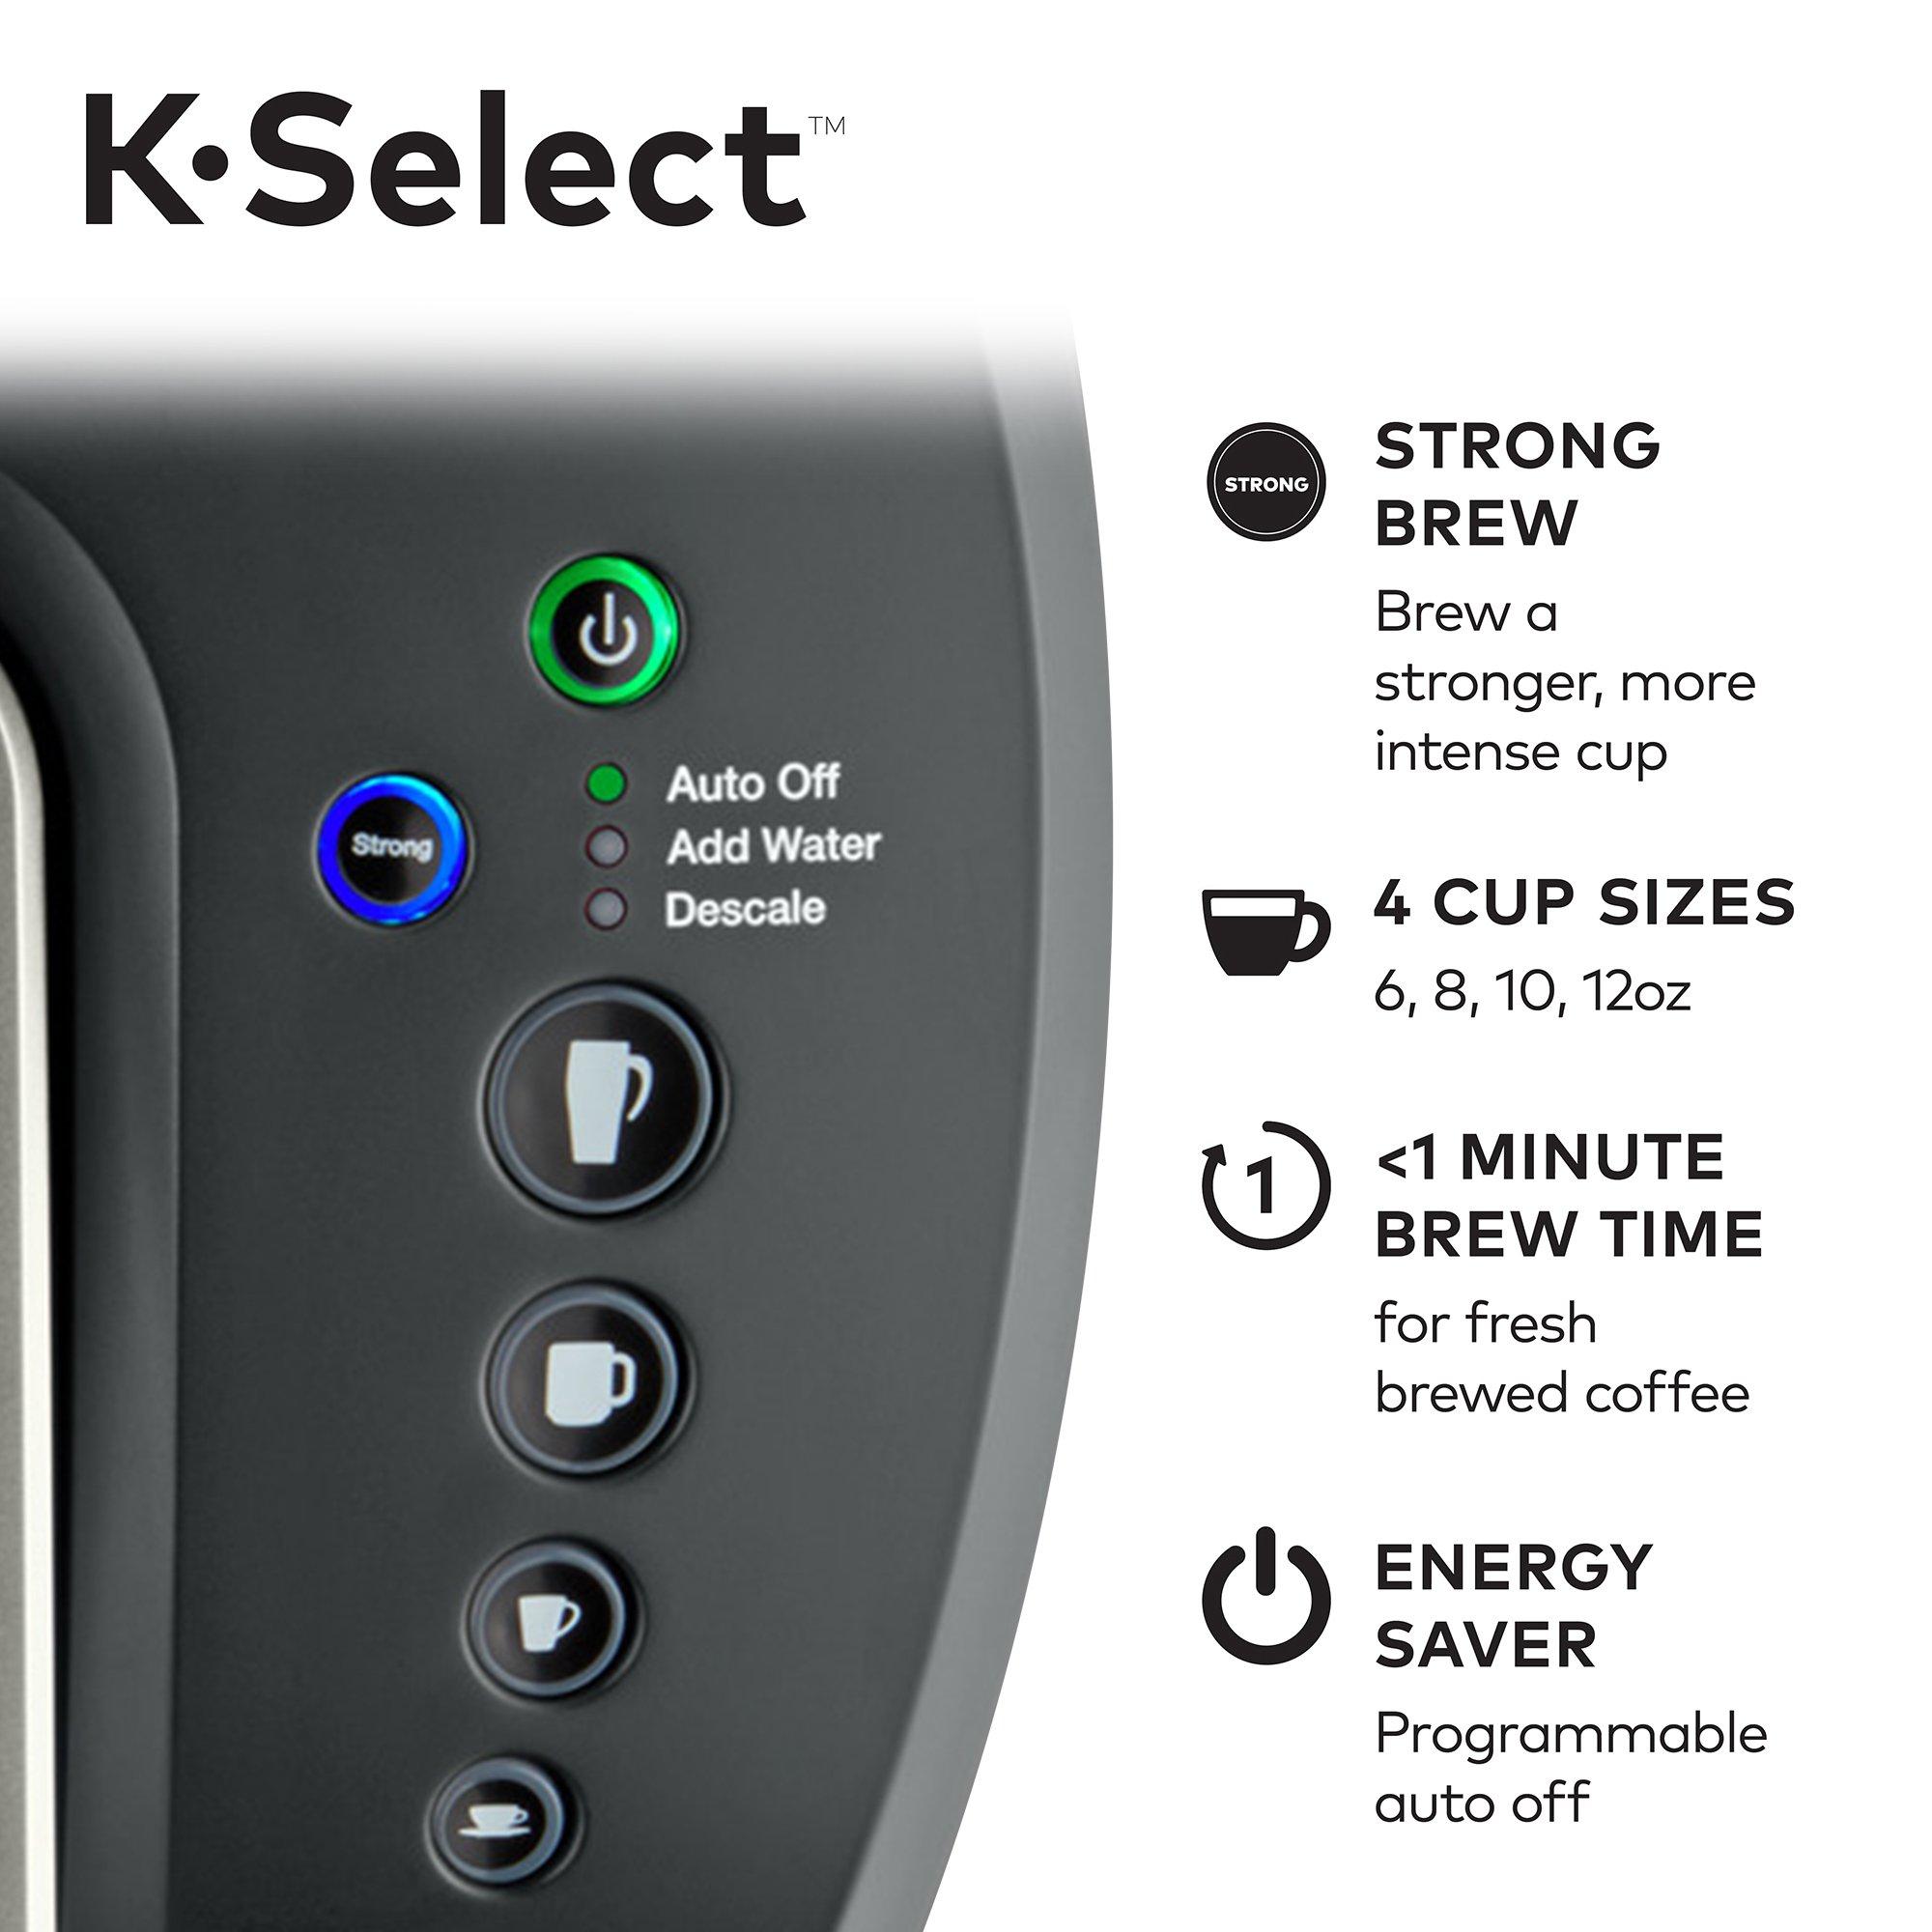 Keurig K-Select Single-Serve K-Cup Pod Coffee Maker with 12oz Brew Size, Strength Control, Matte Black by Keurig (Image #6)